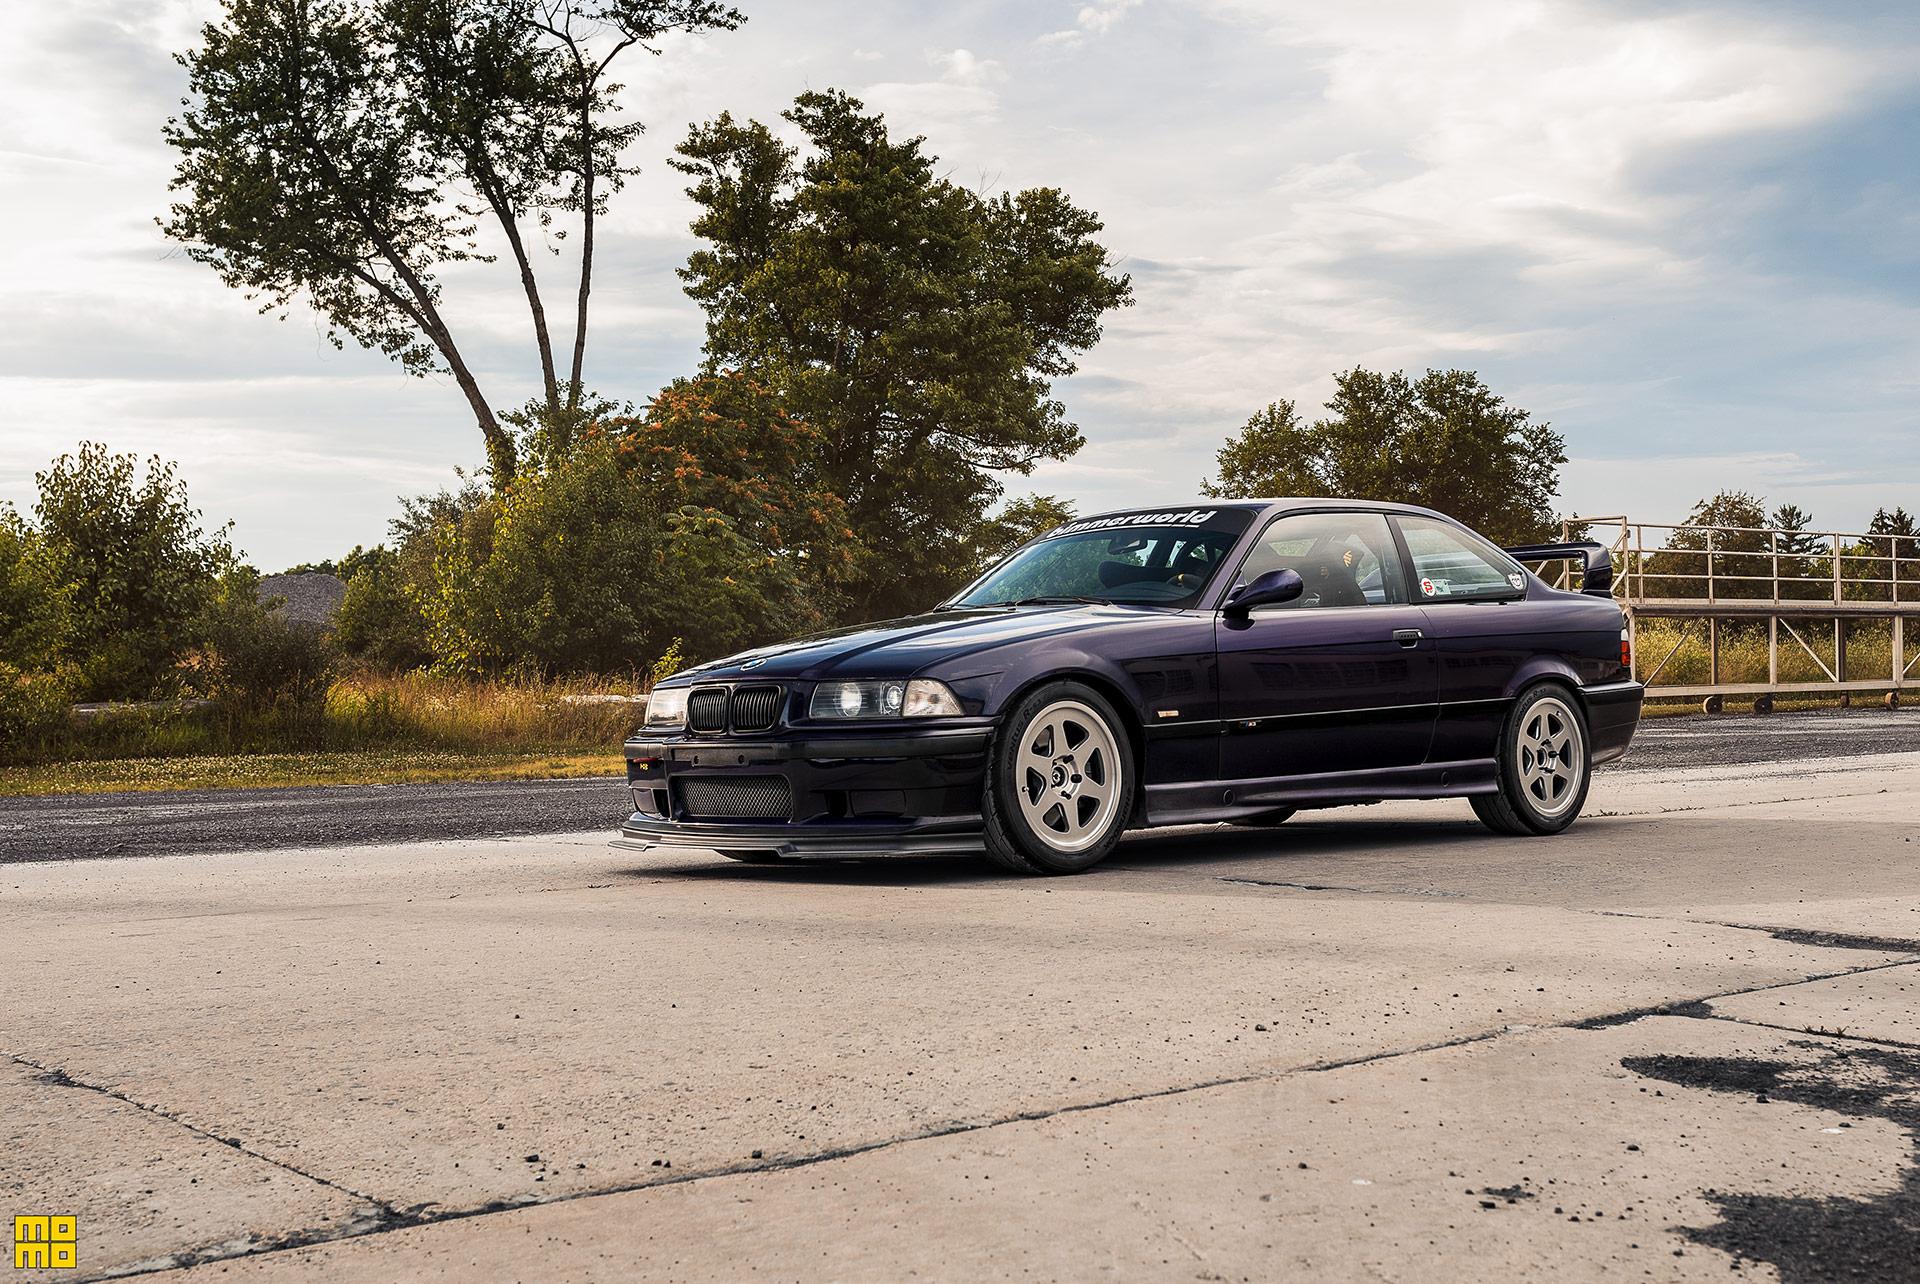 Techno Violet Purple BMW E36 M3 with MOMO Heritage 6 Wheels in Metallic Silver